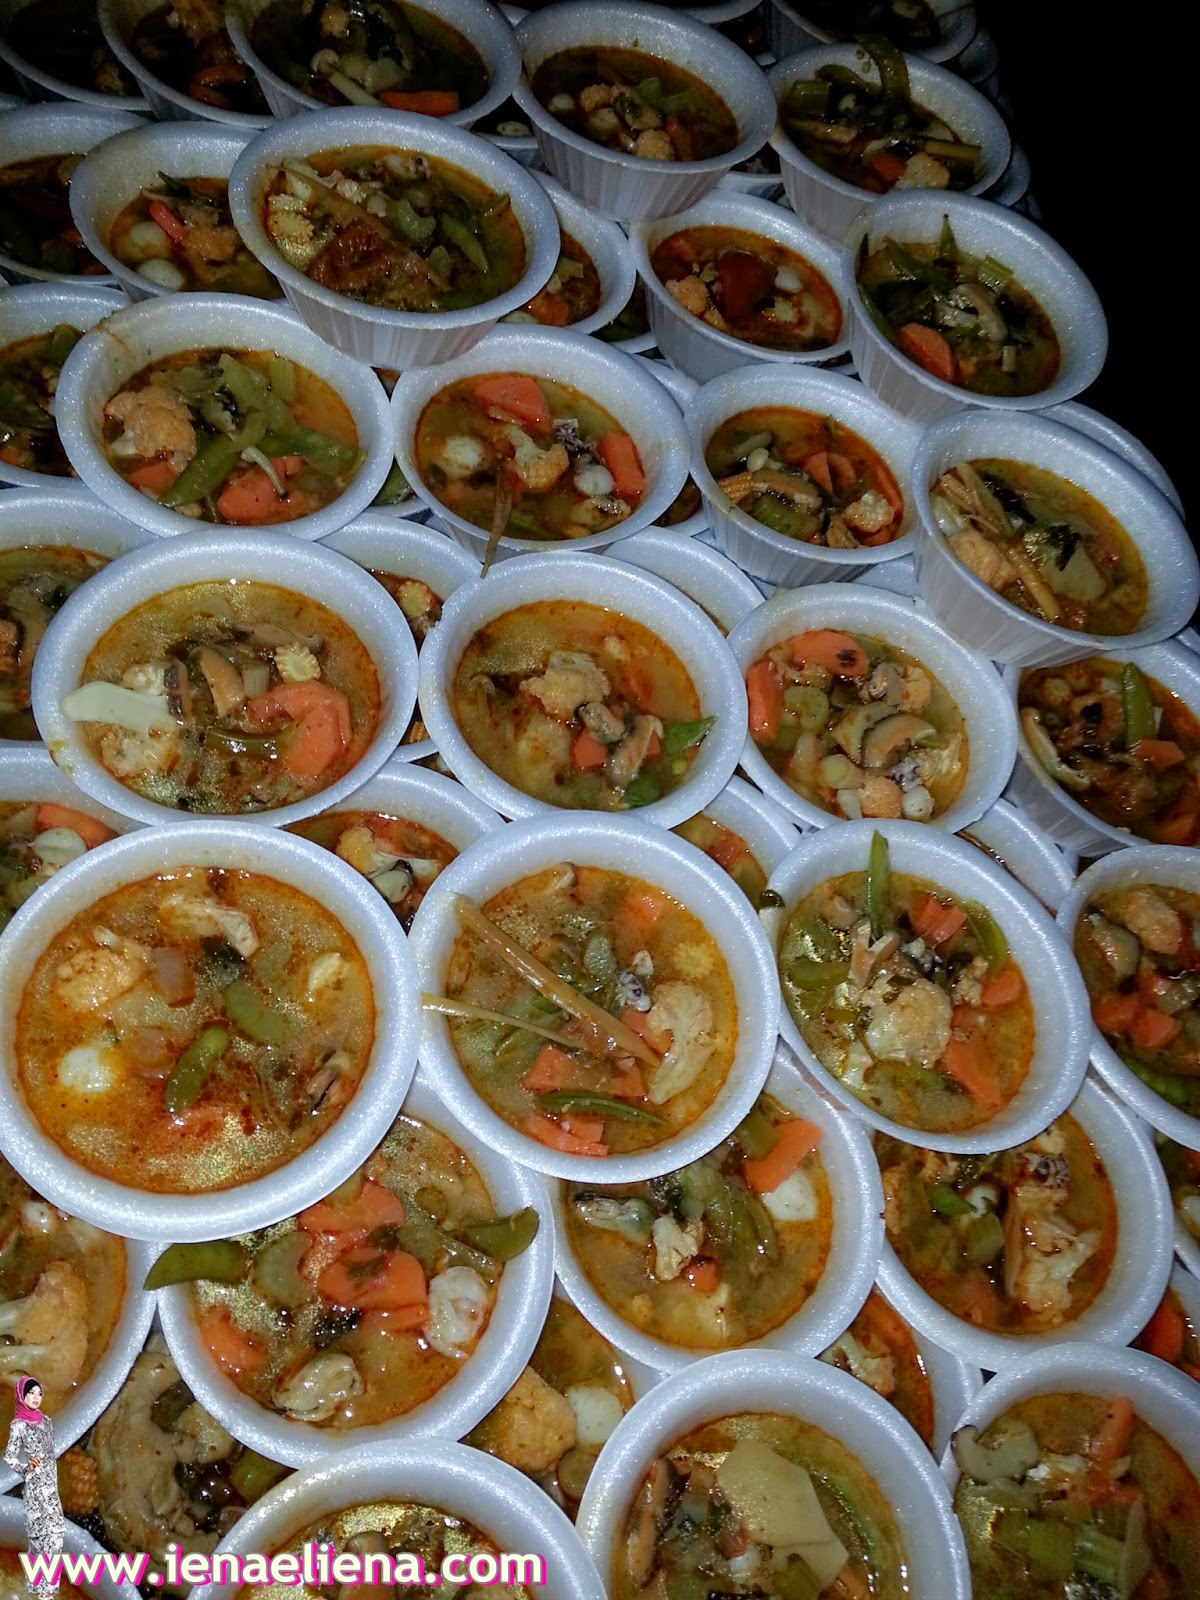 kerja amal memberi makanan buat gelandangan atau homeless